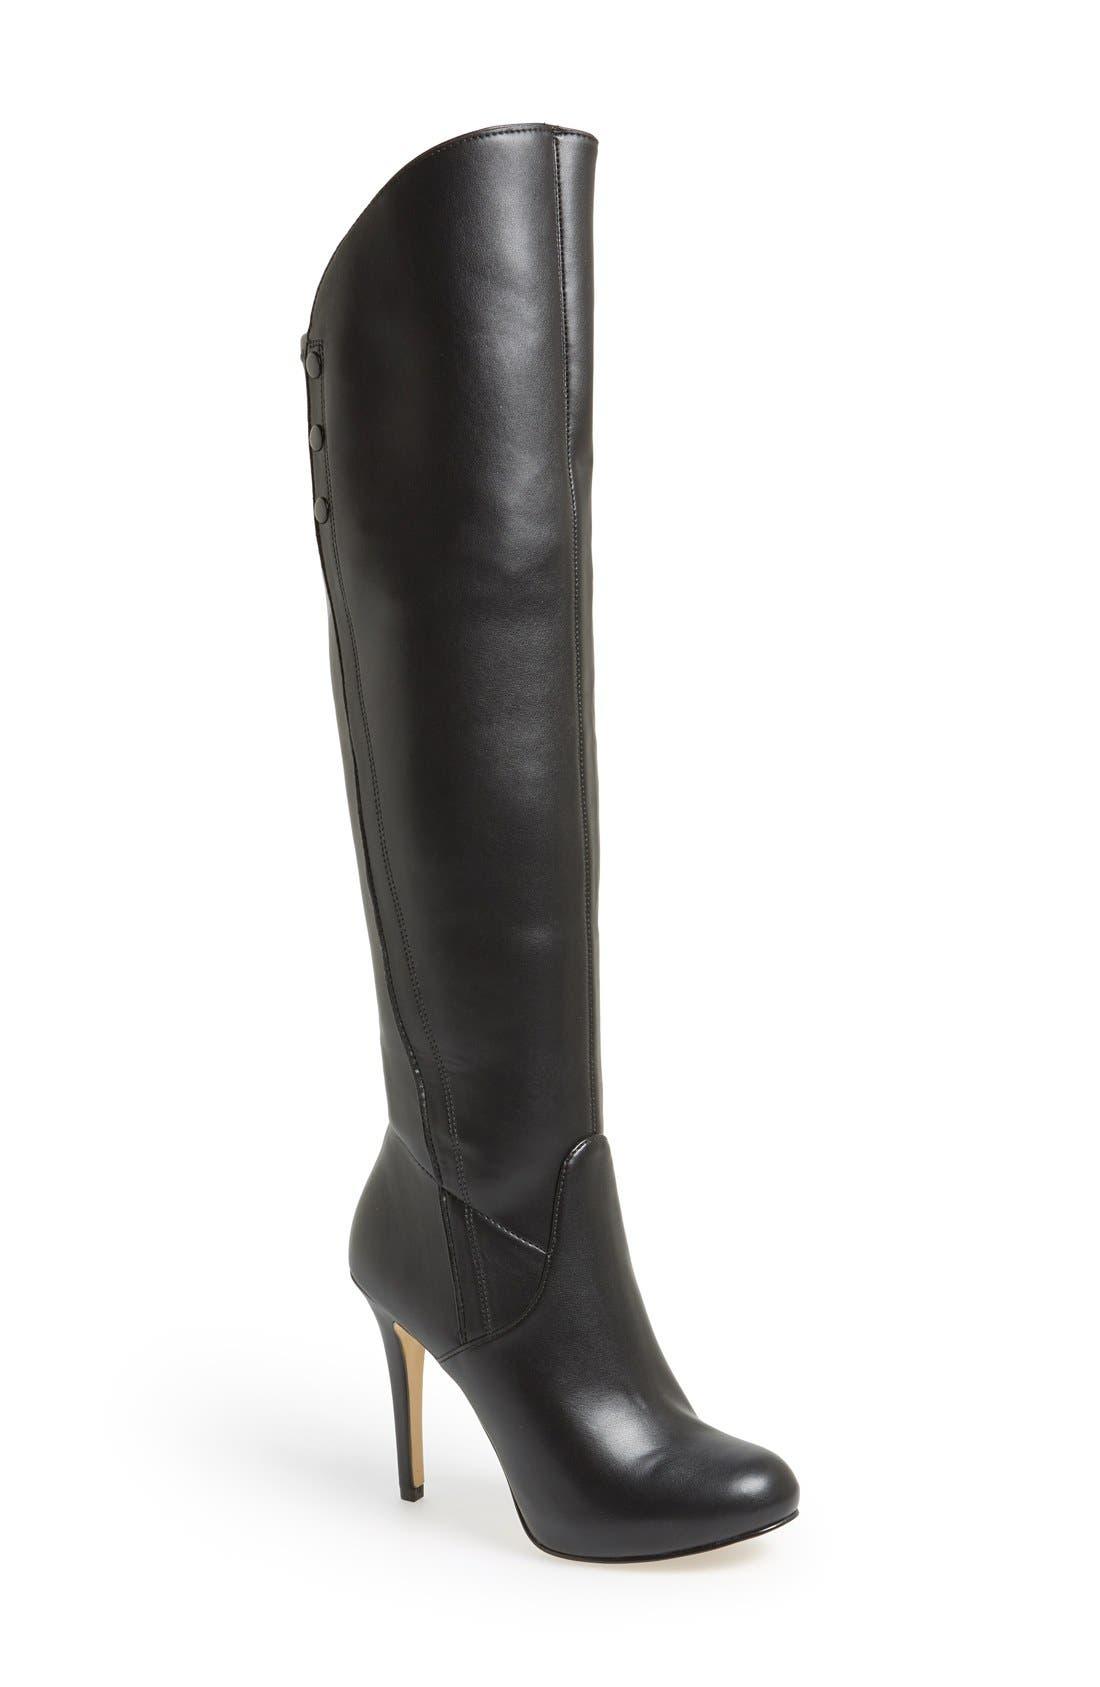 Alternate Image 1 Selected - Guess 'Enesta' Platform Over The Knee Boot (Women)